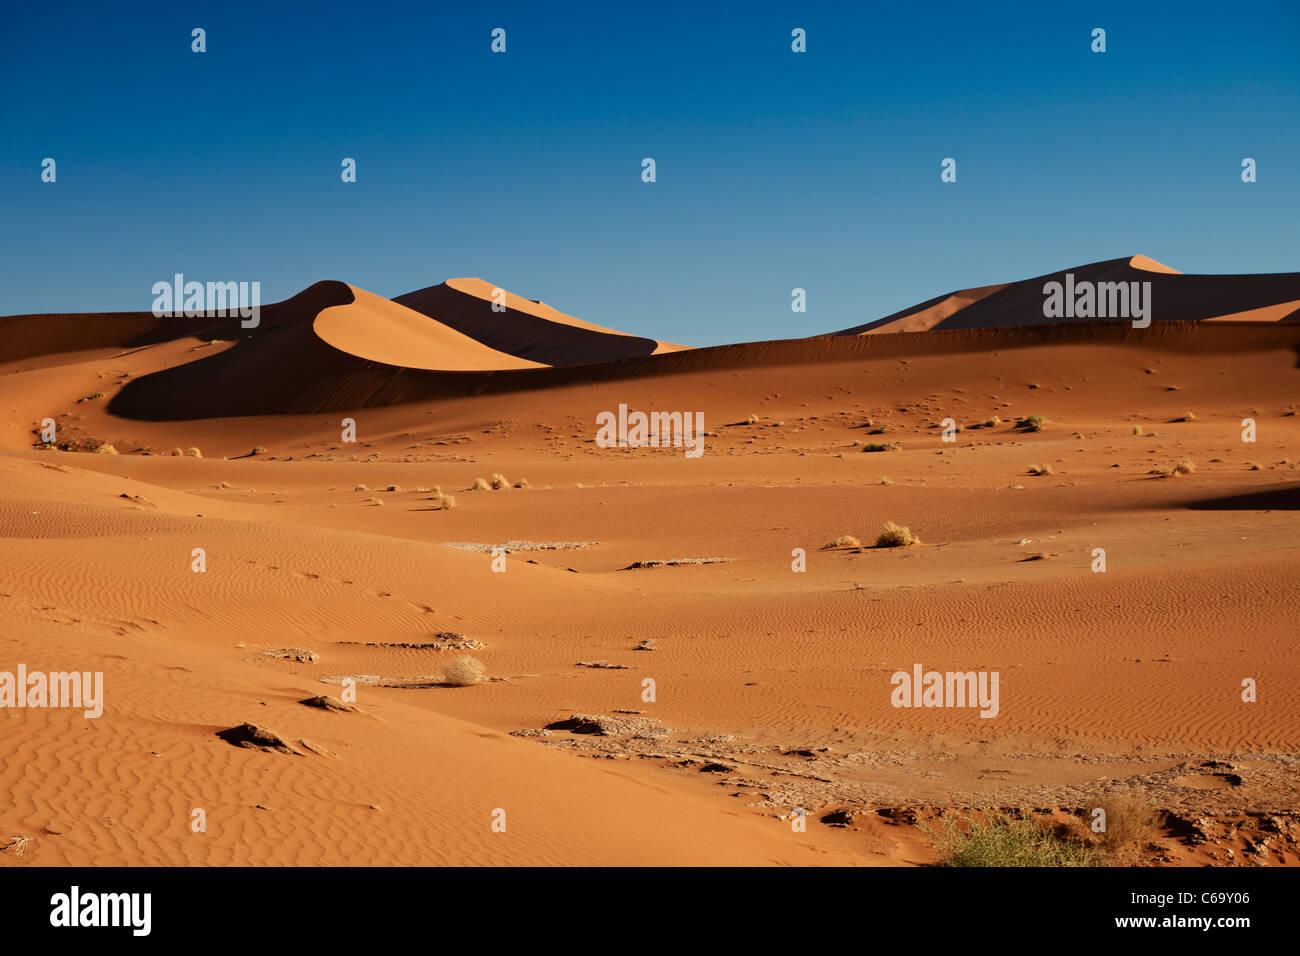 desert landscape of Namib at Sossusvlei, Namib-Naukluft National Park, Namibia, Africa - Stock Image